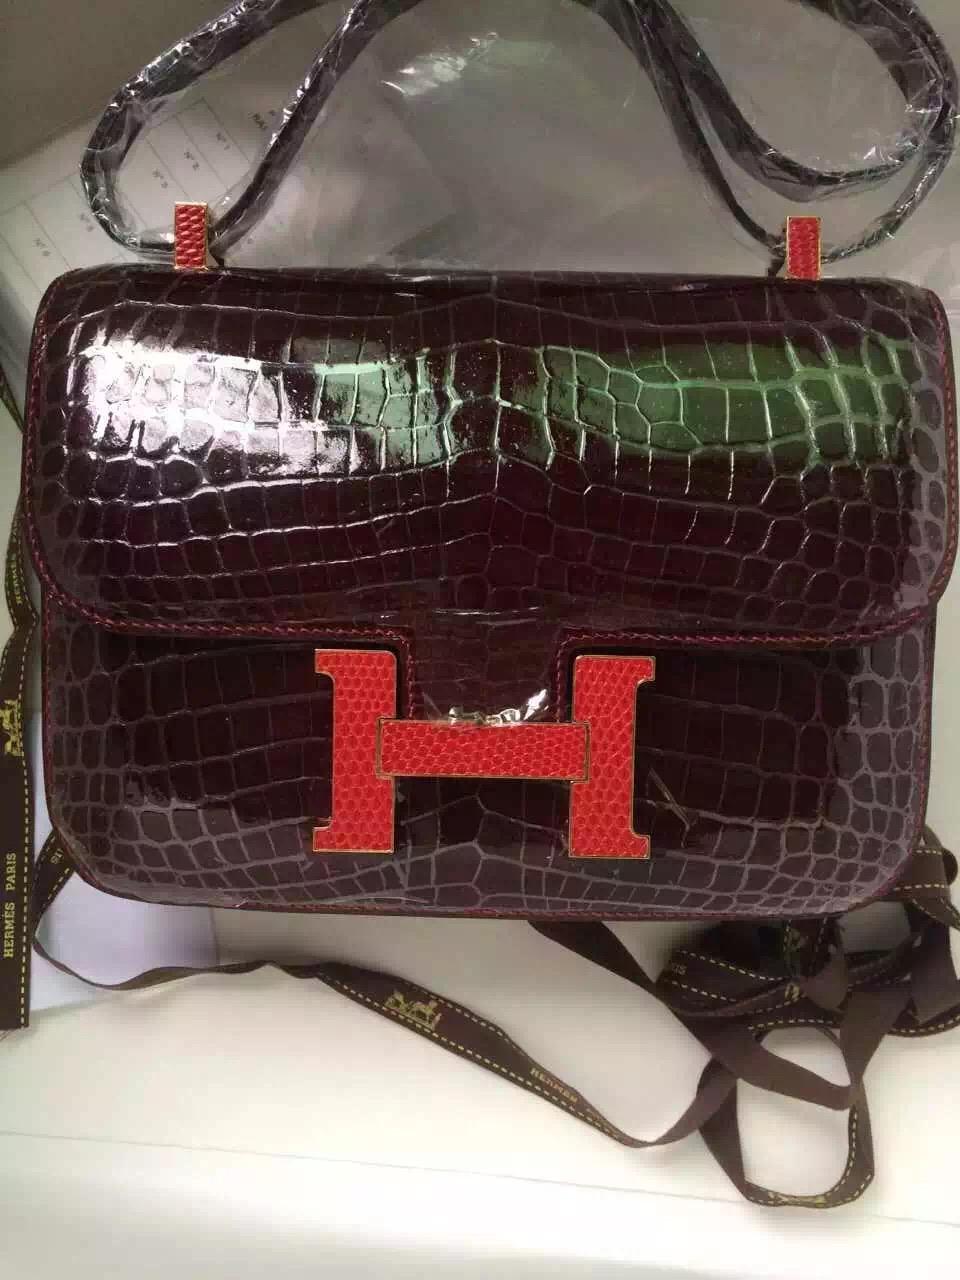 Hermes Bordeaux Red Crocodile Shiny Leather Constance Bag 19CM Lizard Buckle